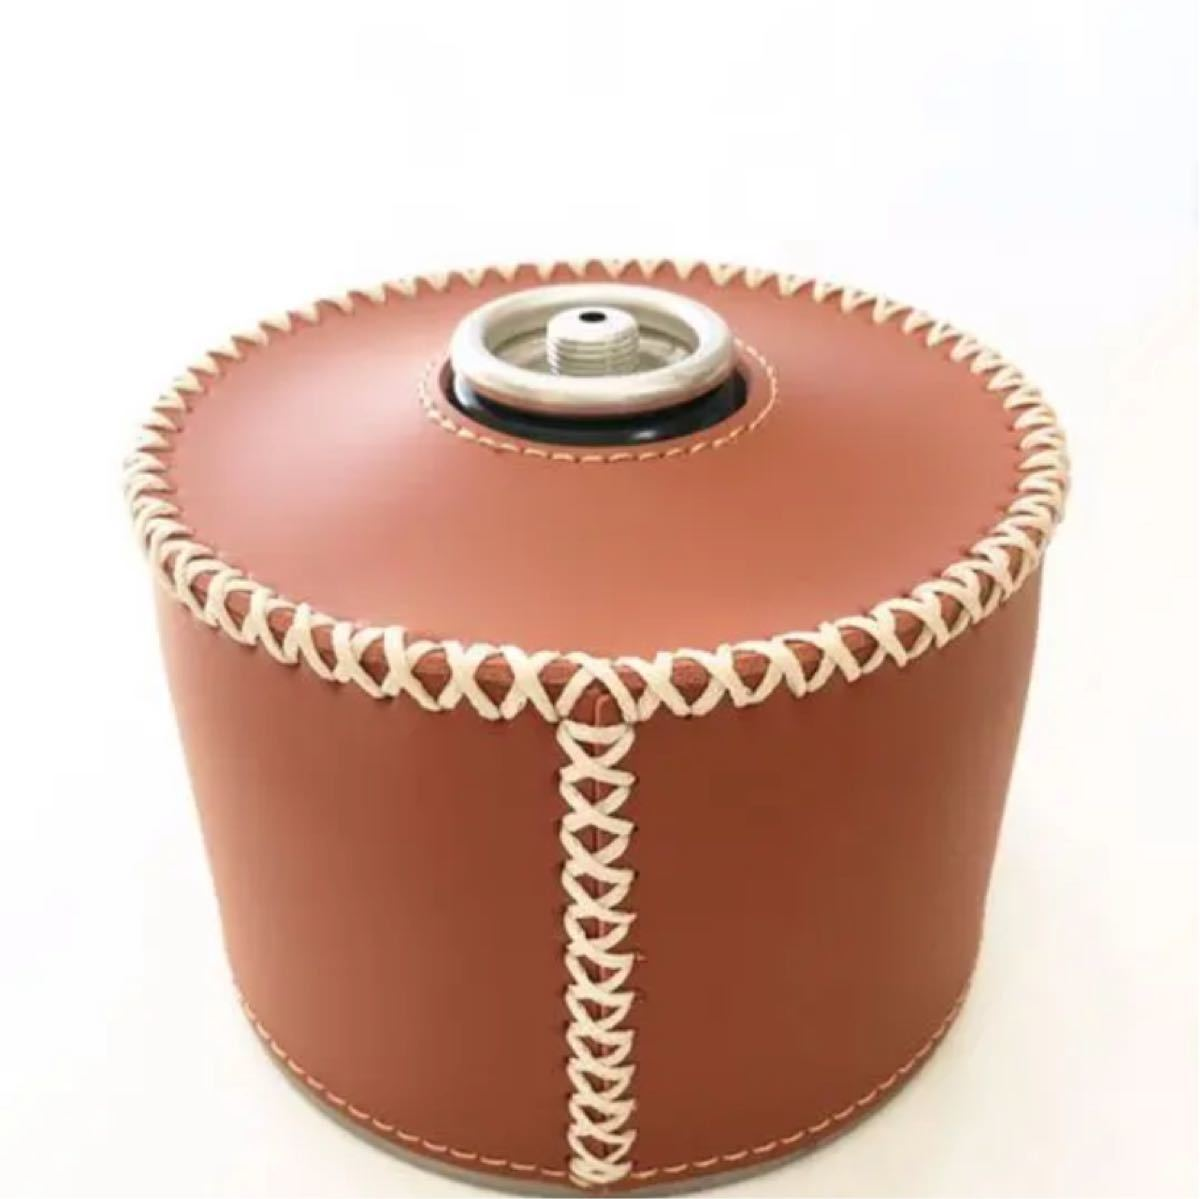 od缶 レザーカバー 【1個】ブラウン ソロキャンプ コールマン ルミエールランタン OD缶 ガス缶